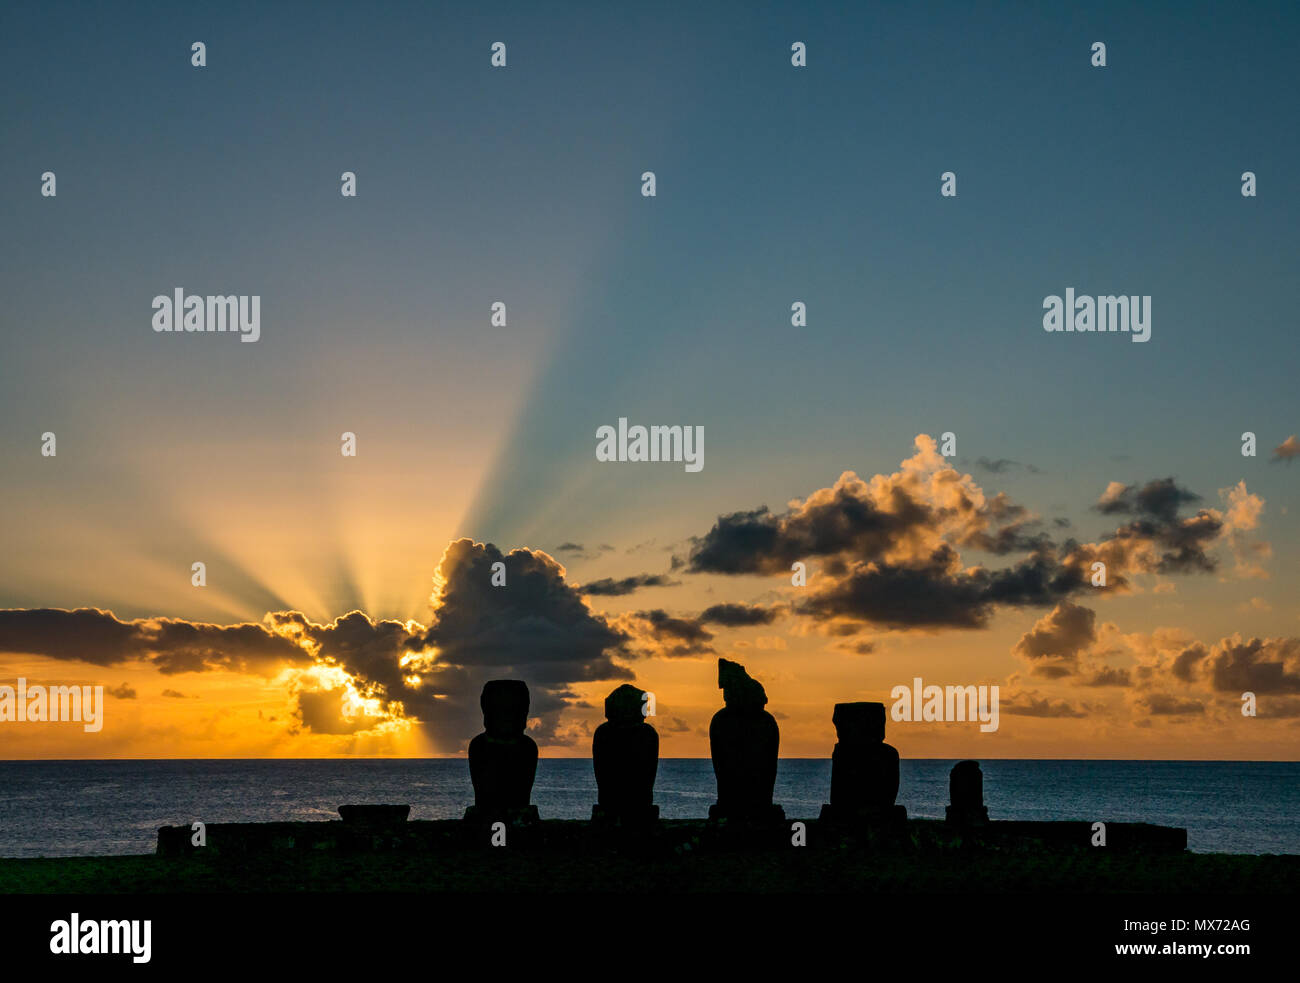 Dramatische bunt orange Sonnenuntergang und sunburst Licht mit Ahu Tahai, Moai Silhouetten, Hanga Roa, Rapa Nui, Chile Stockbild